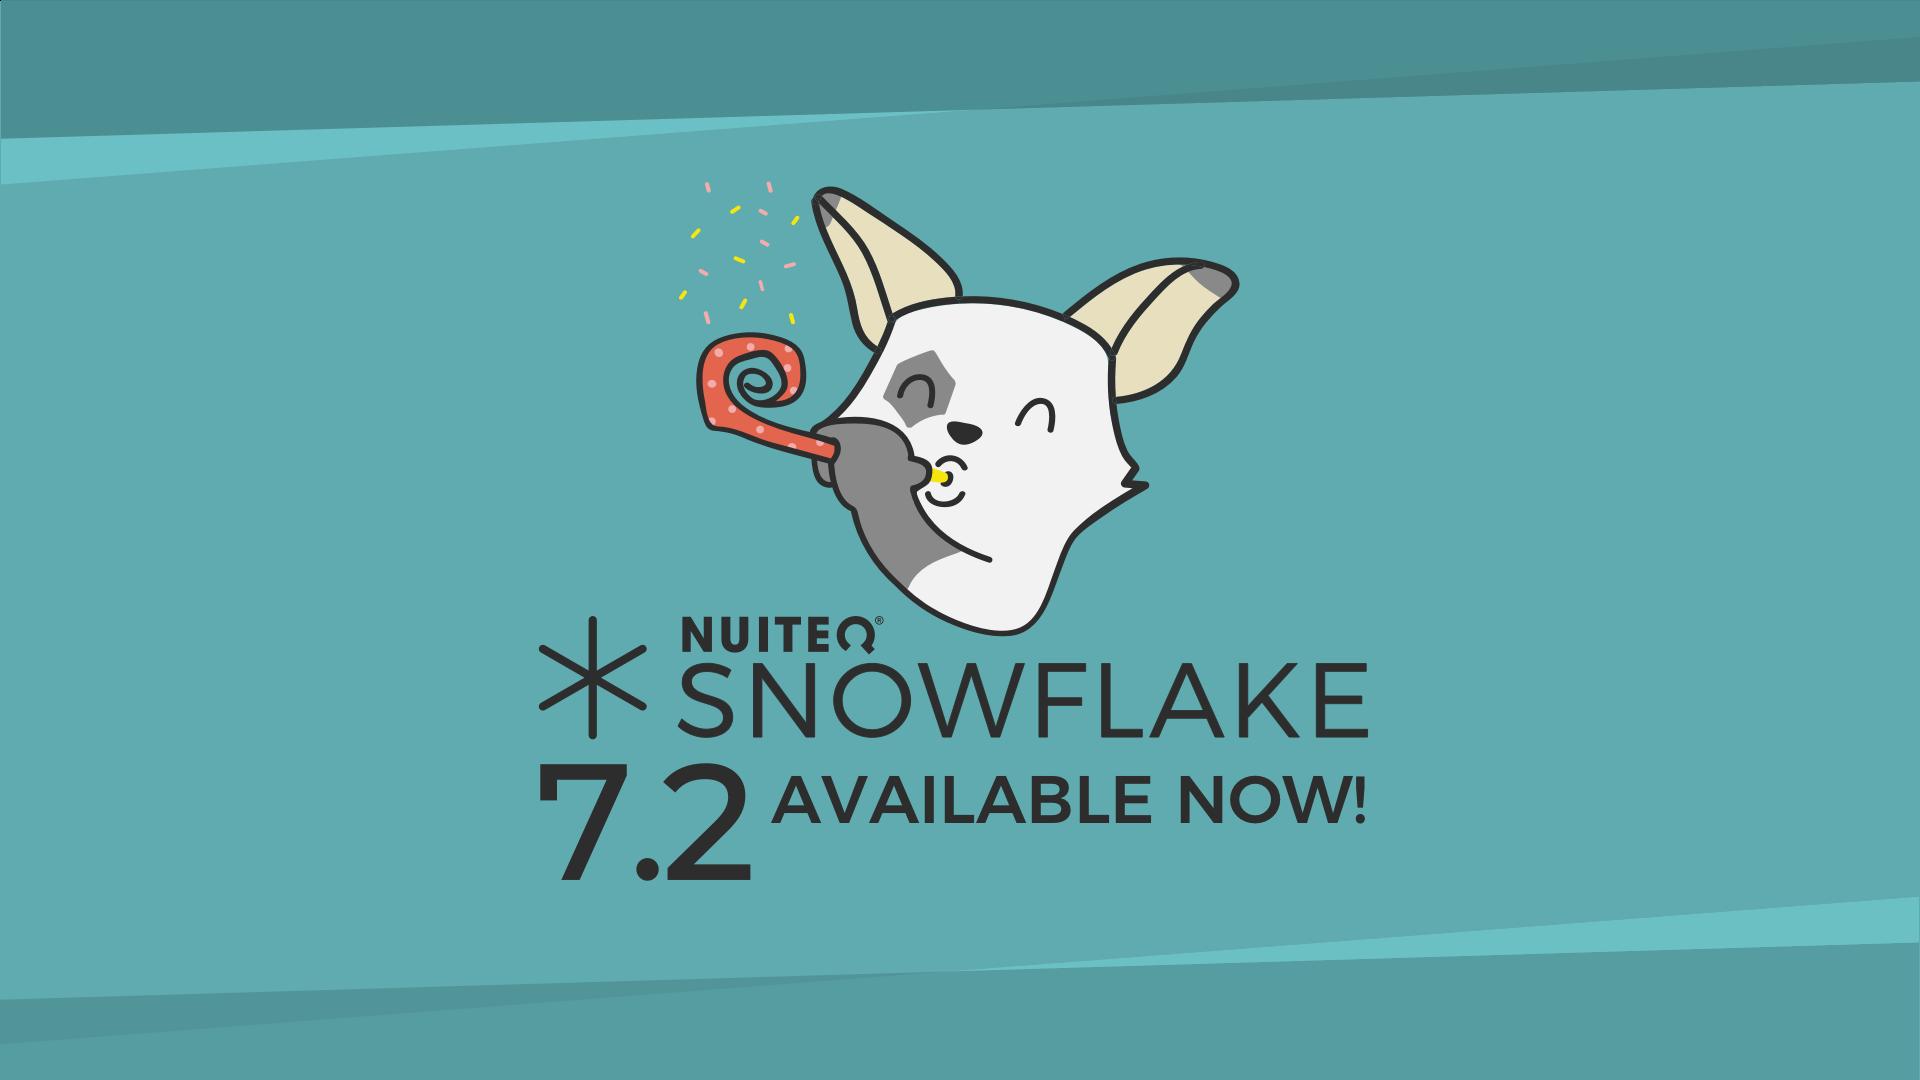 Snowflake 7.2